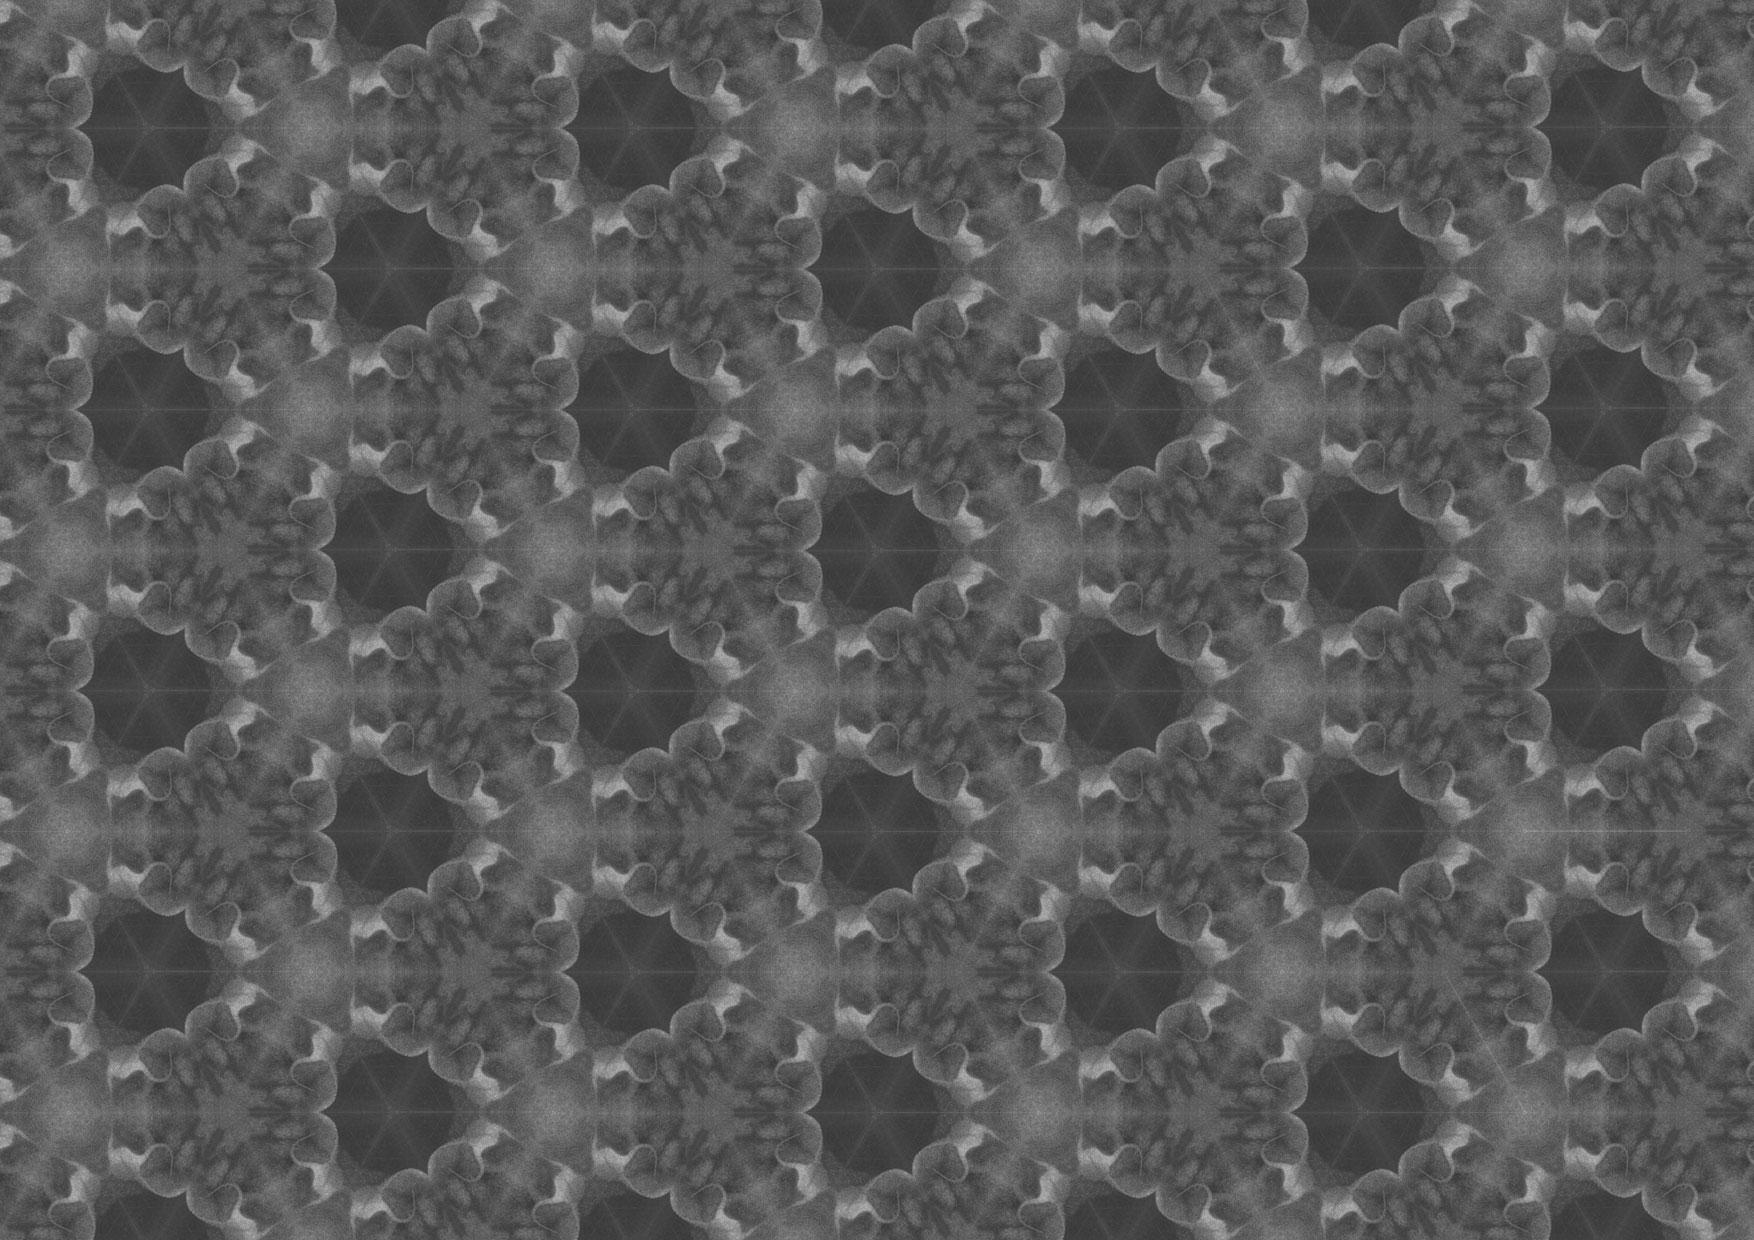 kaleidoskop3.jpg